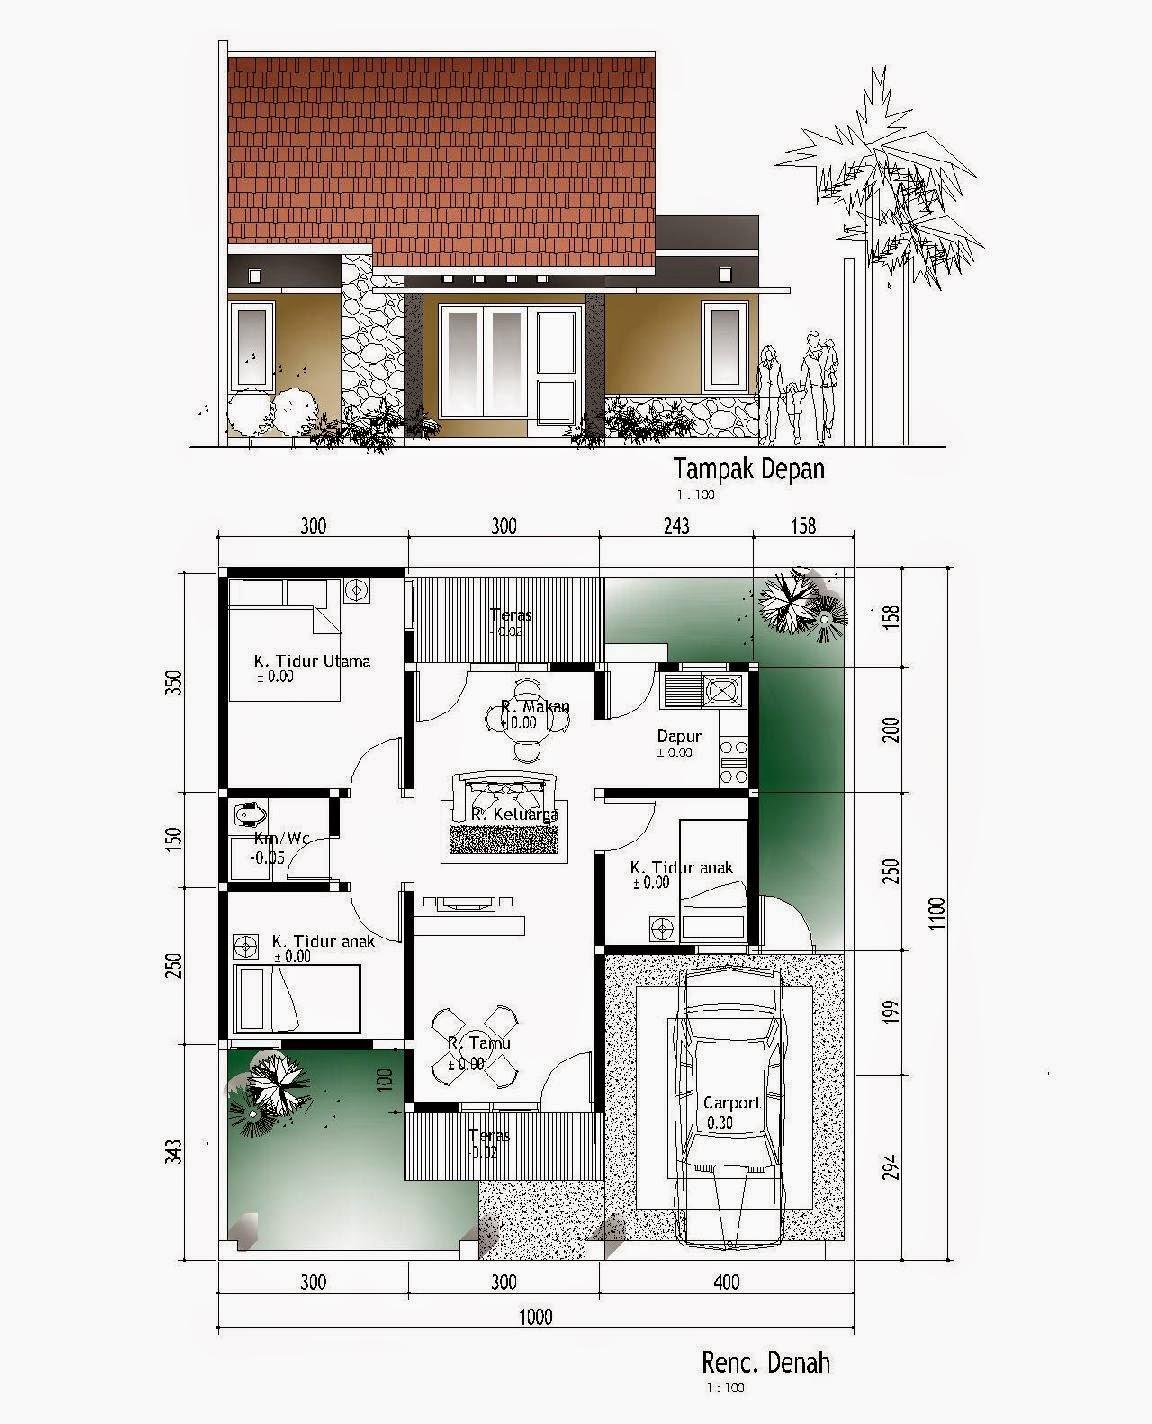 Rancangan Denah Rumah Minimalis Arsitek Rumah Minimalis